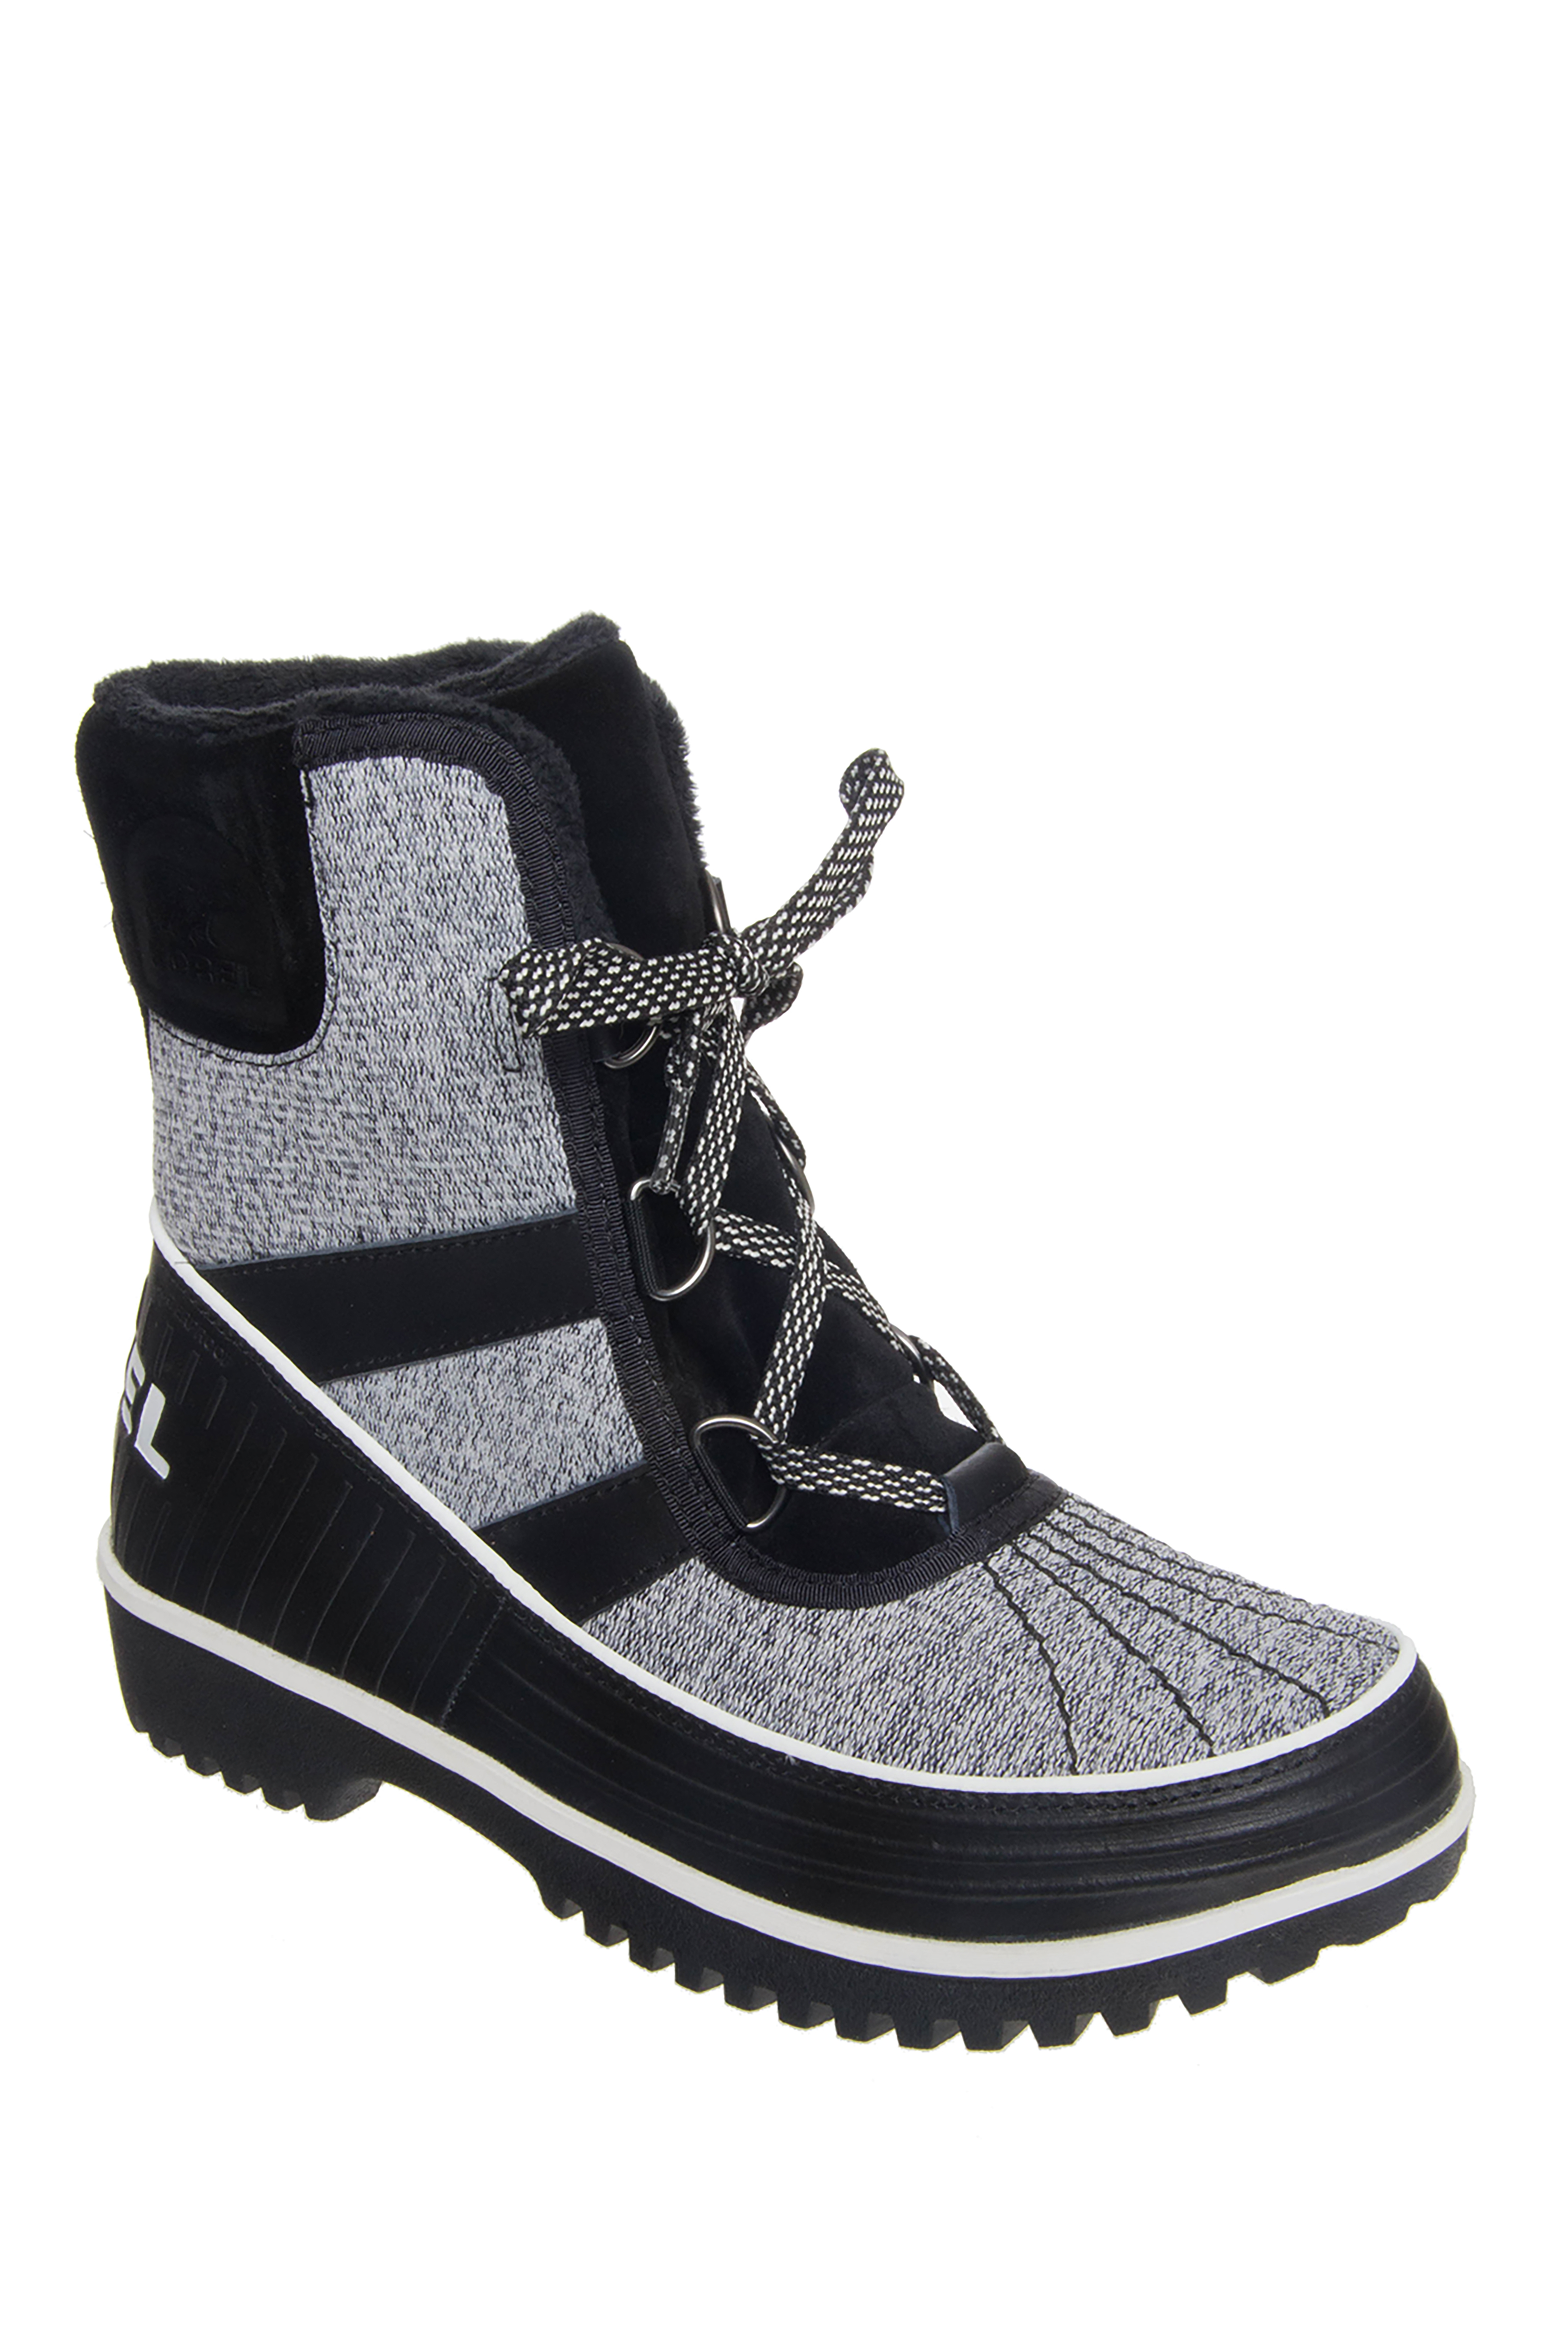 Sorel Tivoli II Sweatshirt Snow Boots - Black